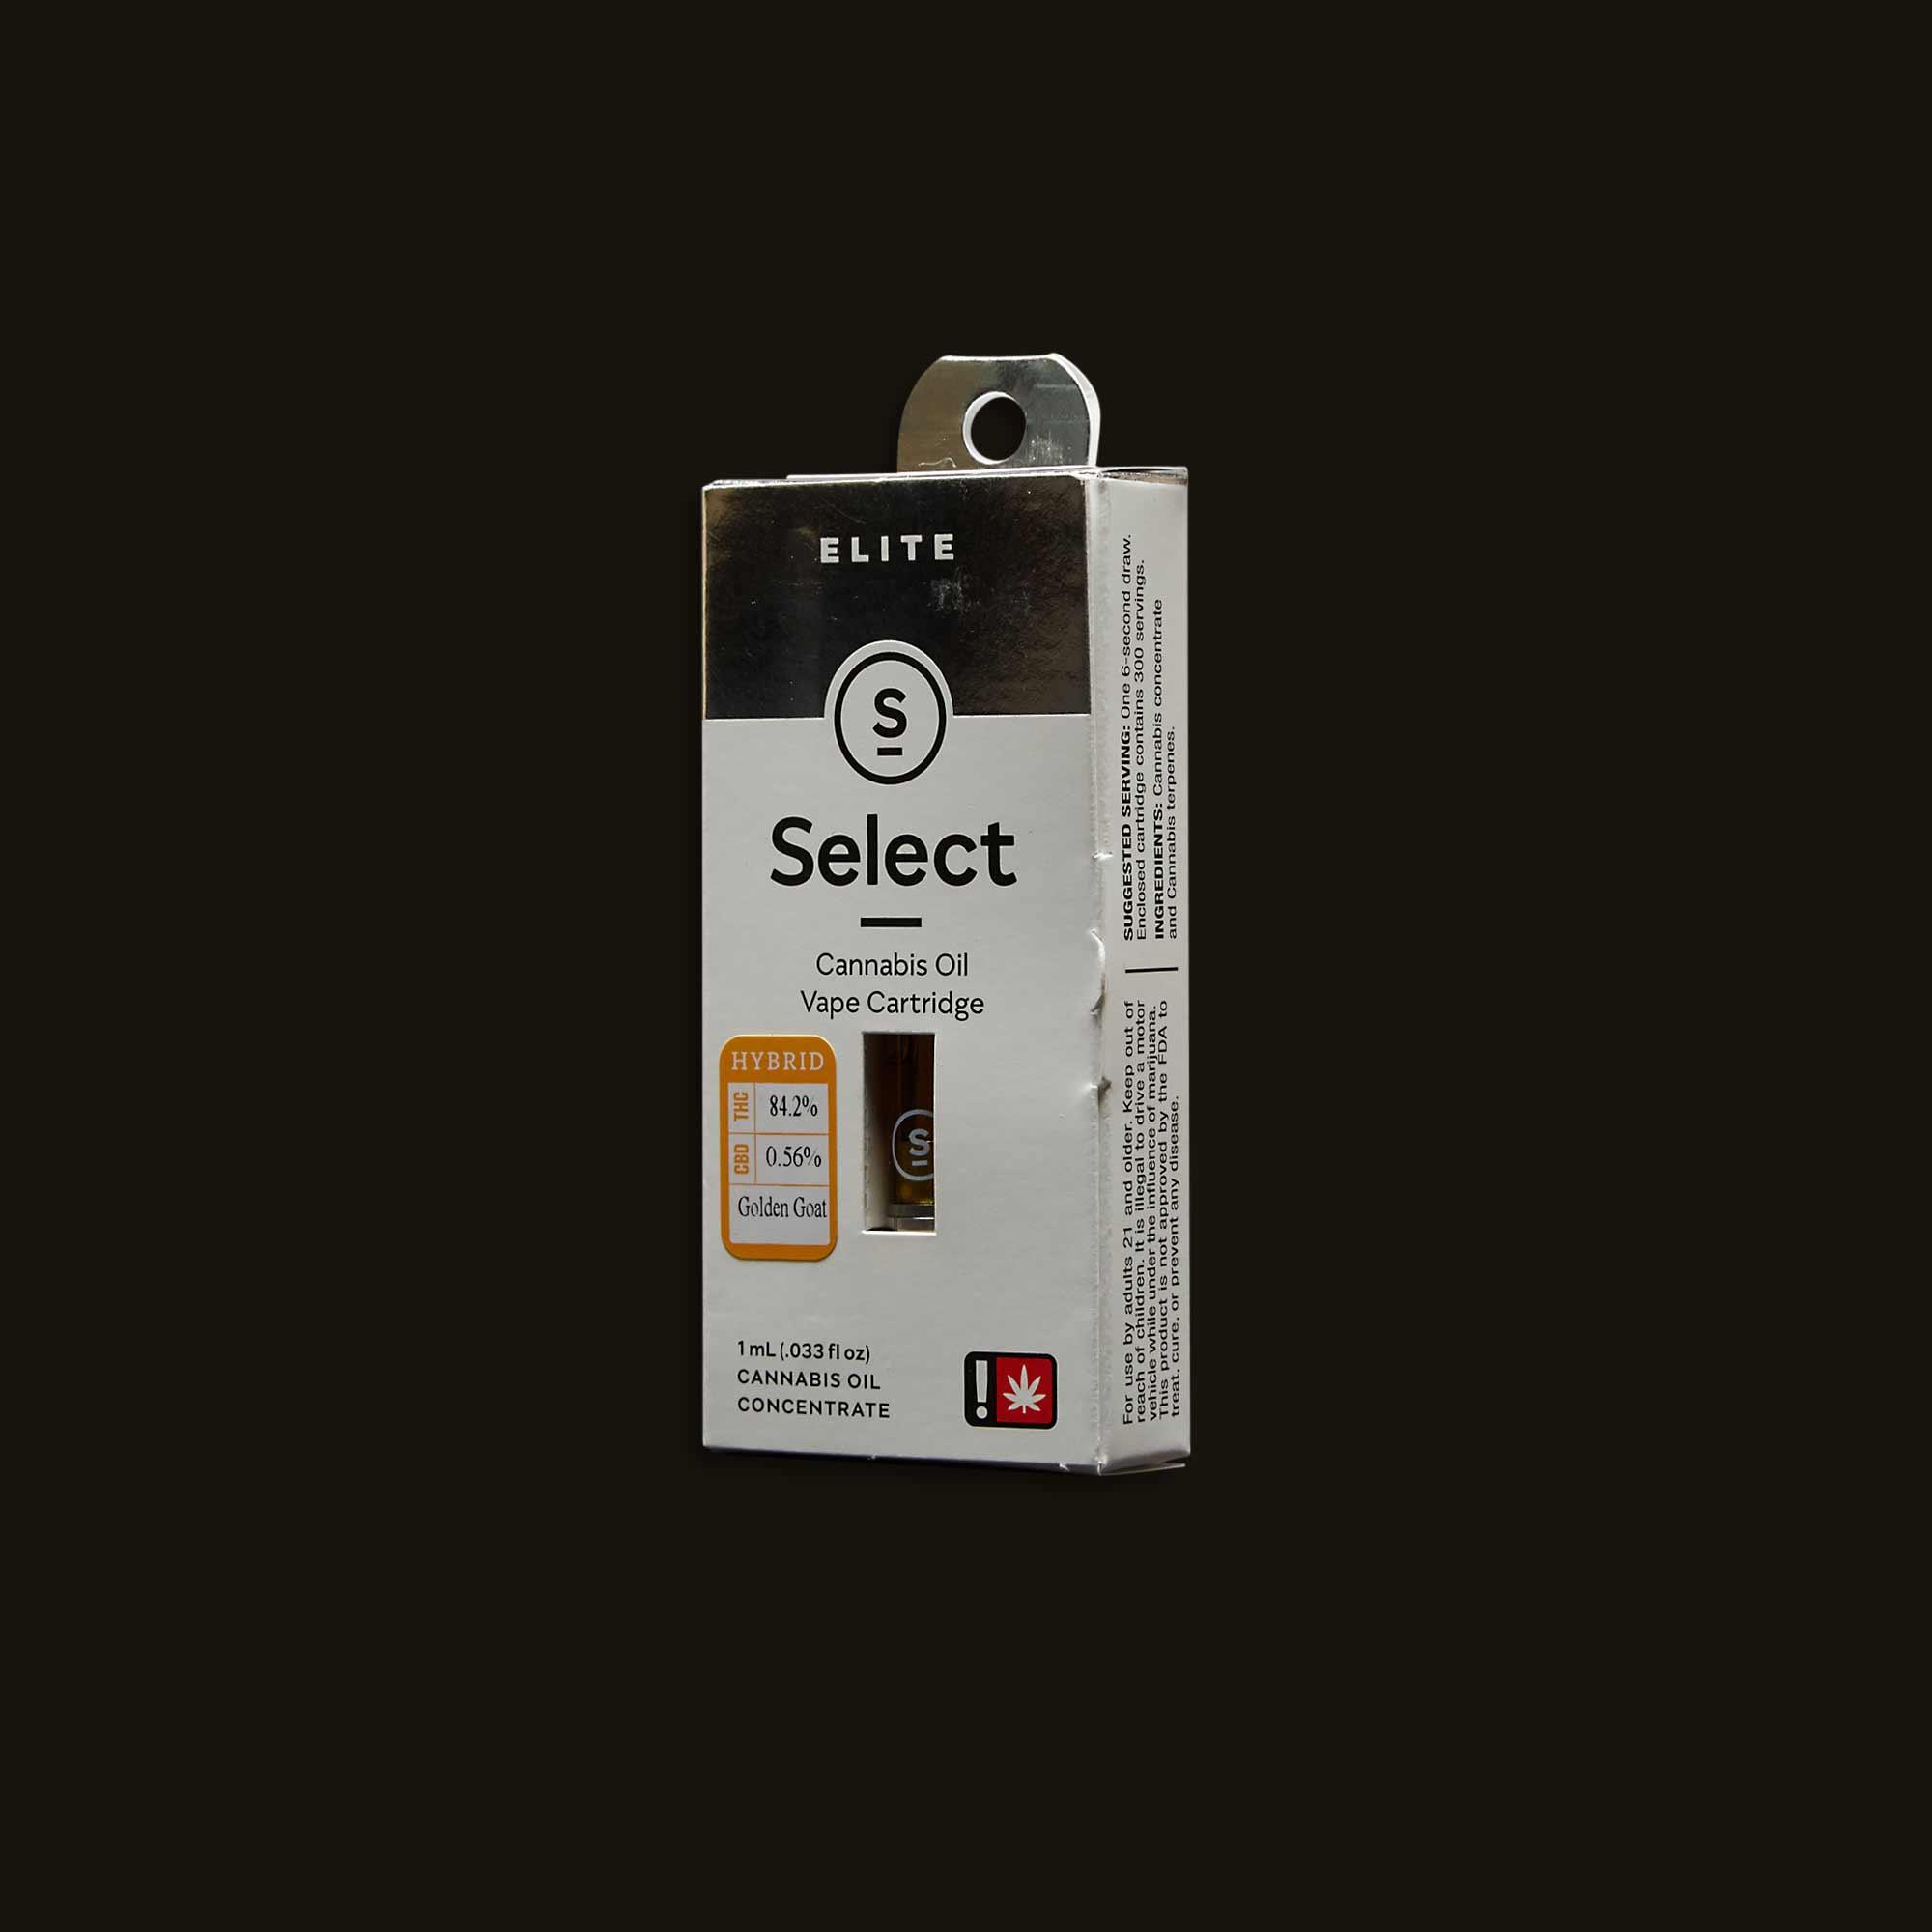 Select Golden Goat Elite Cartridge